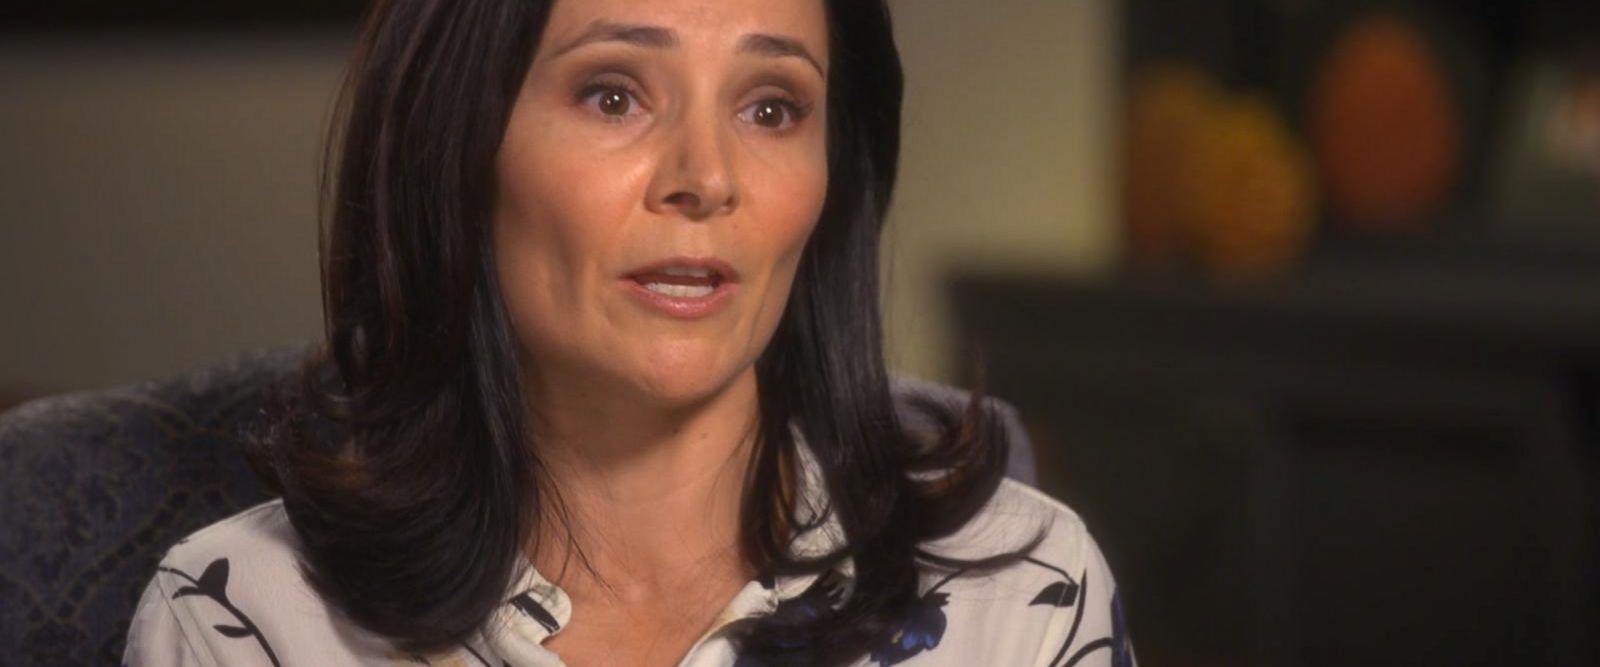 VIDEO: Former NXIVM member says she was invited into secret sorority then branded